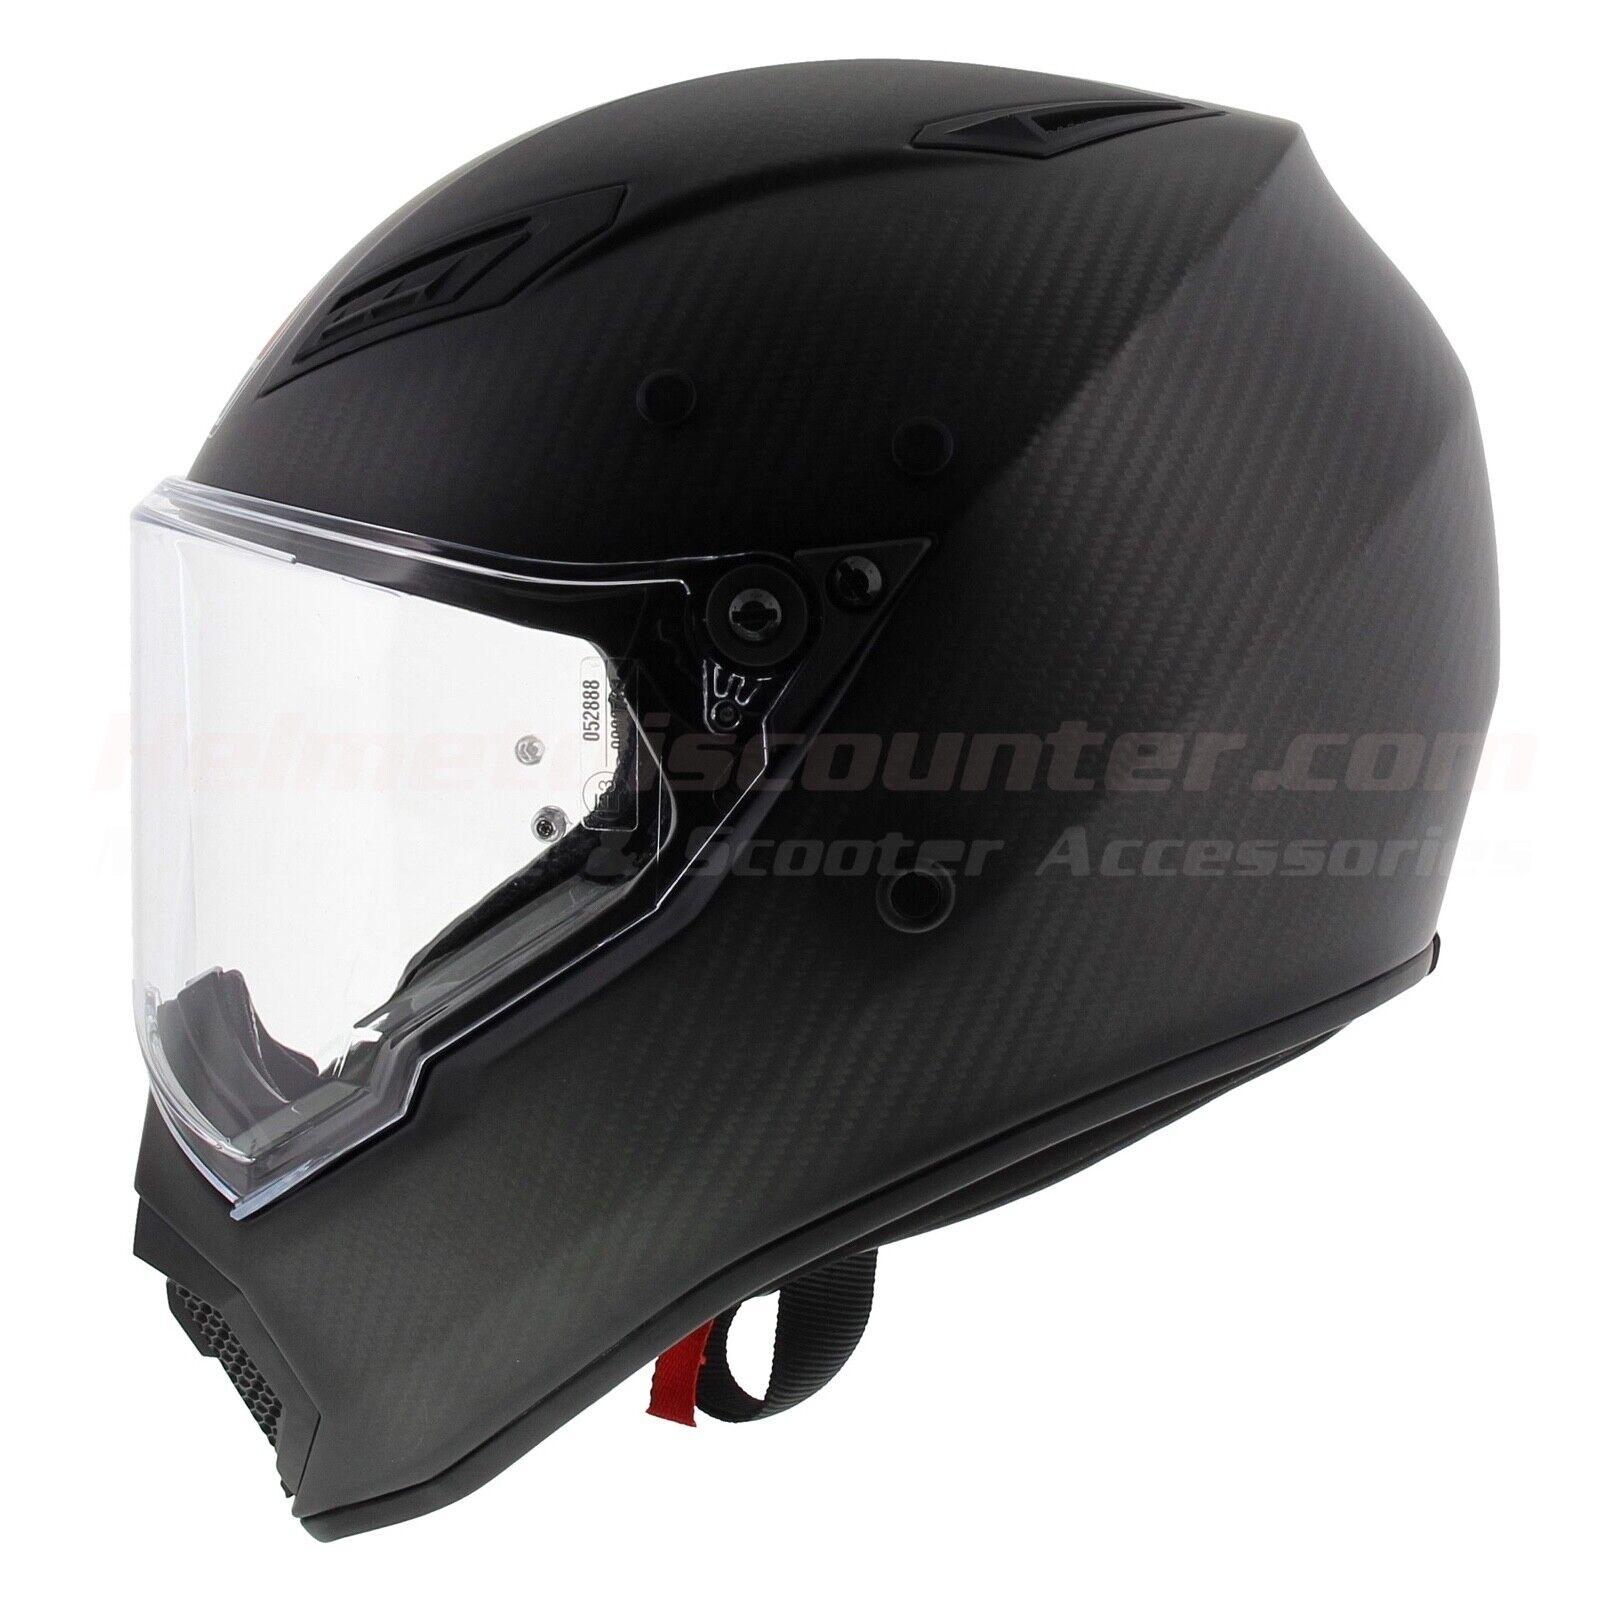 AGV AX9 AX-9 Matt Carbon, Offroad Motorcycle Helmet Fast